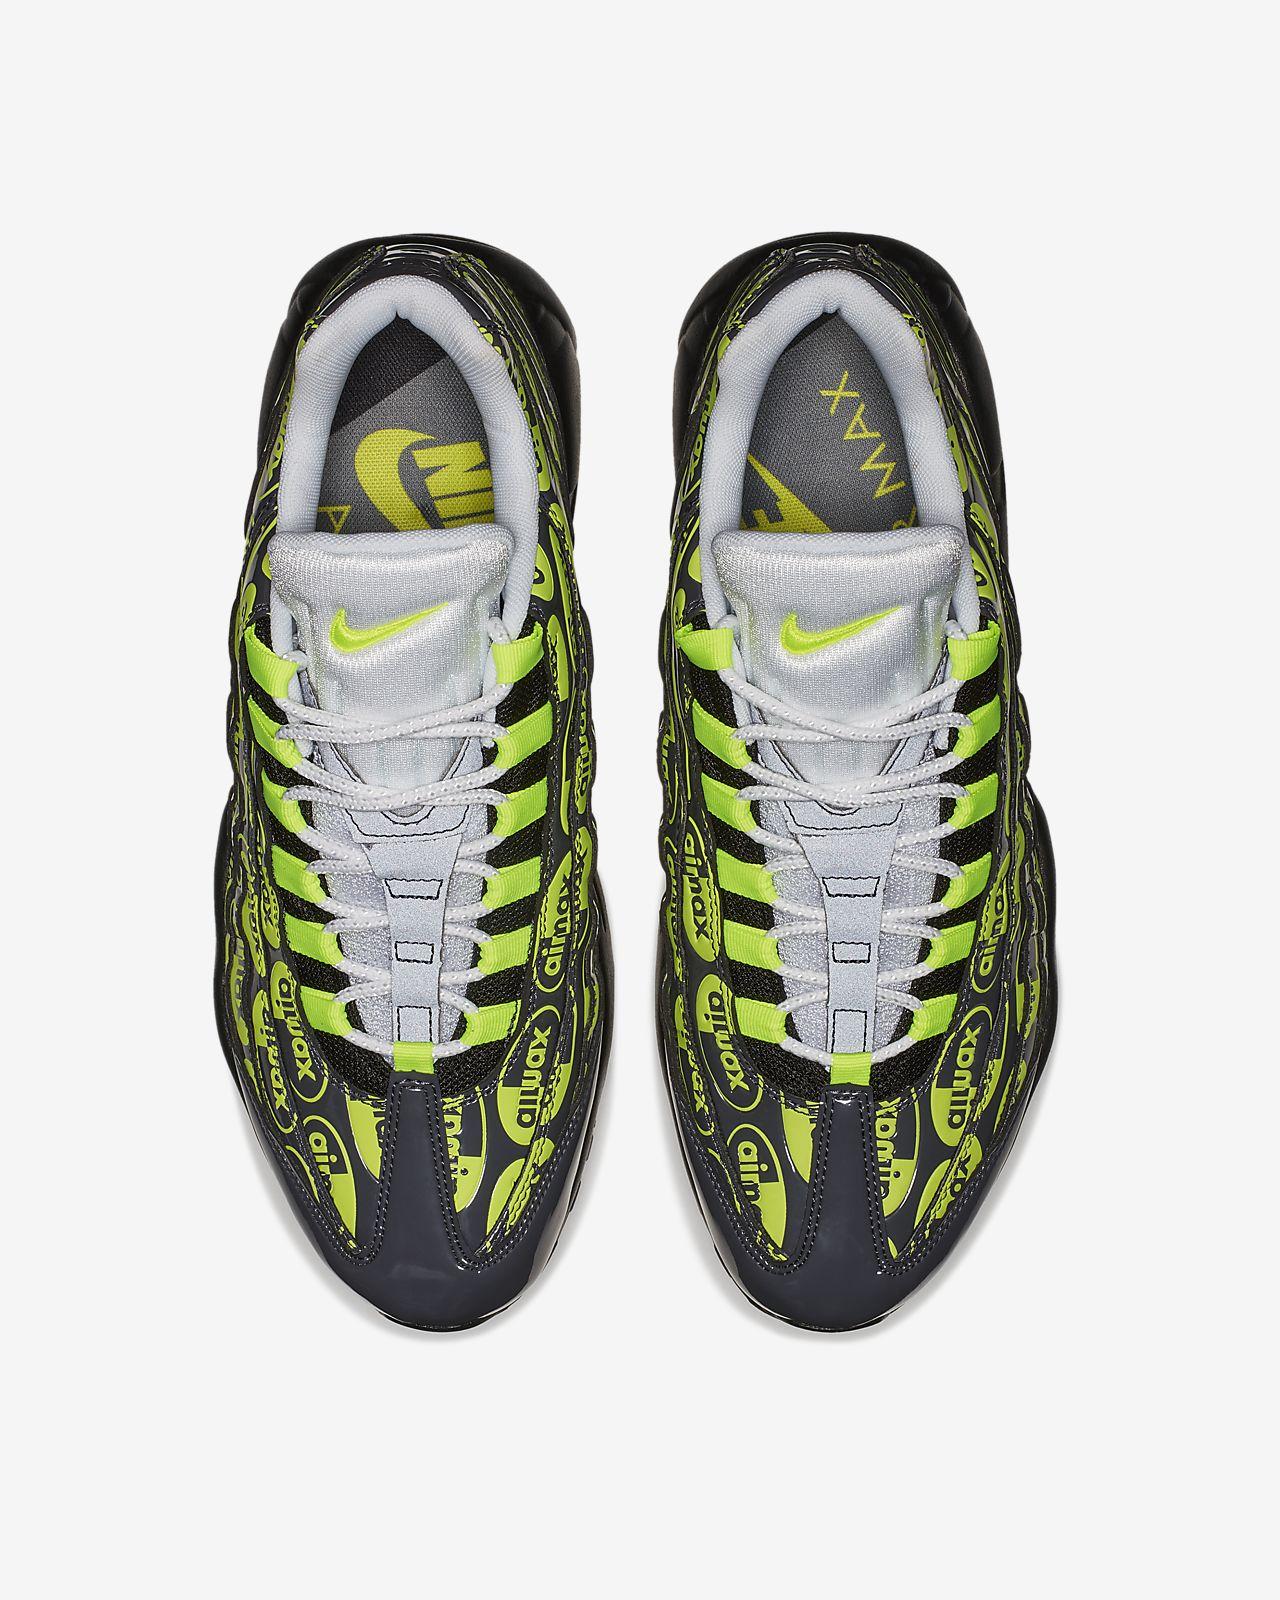 cc0bdf5841 Nike Air Max 95 Premium Men's Shoe. Nike.com